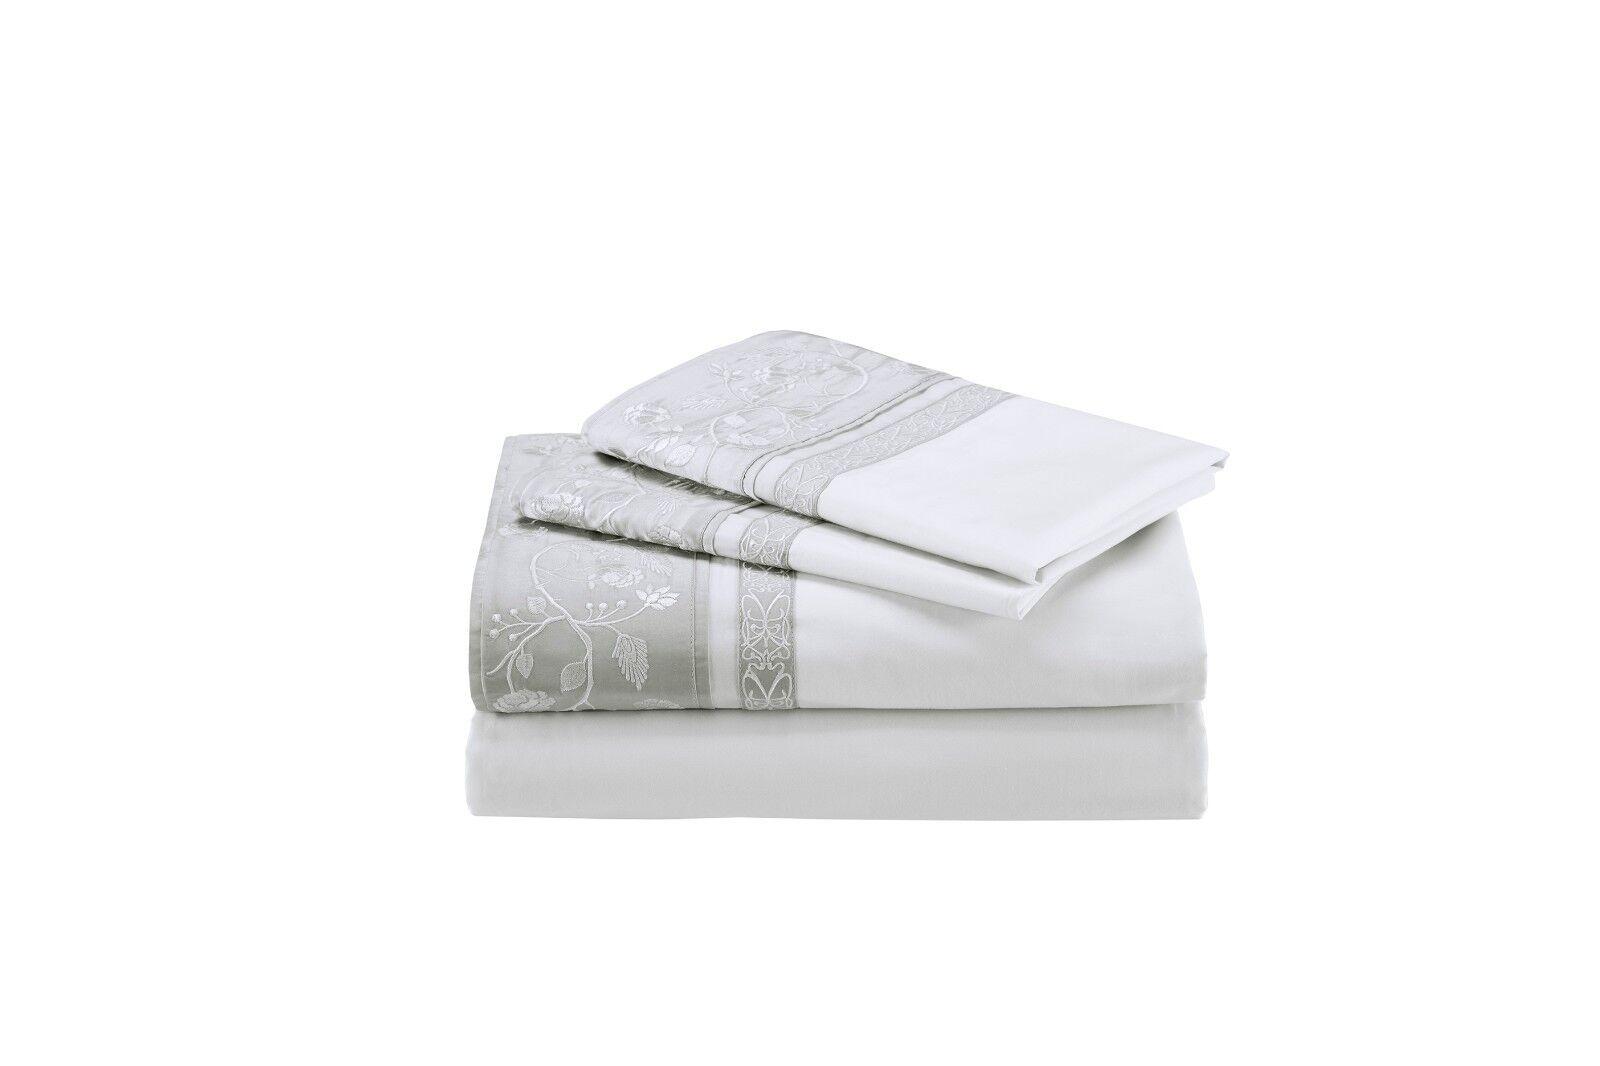 Natori madame ning King or Queen flat sheet NA20-2064, NA20-2065